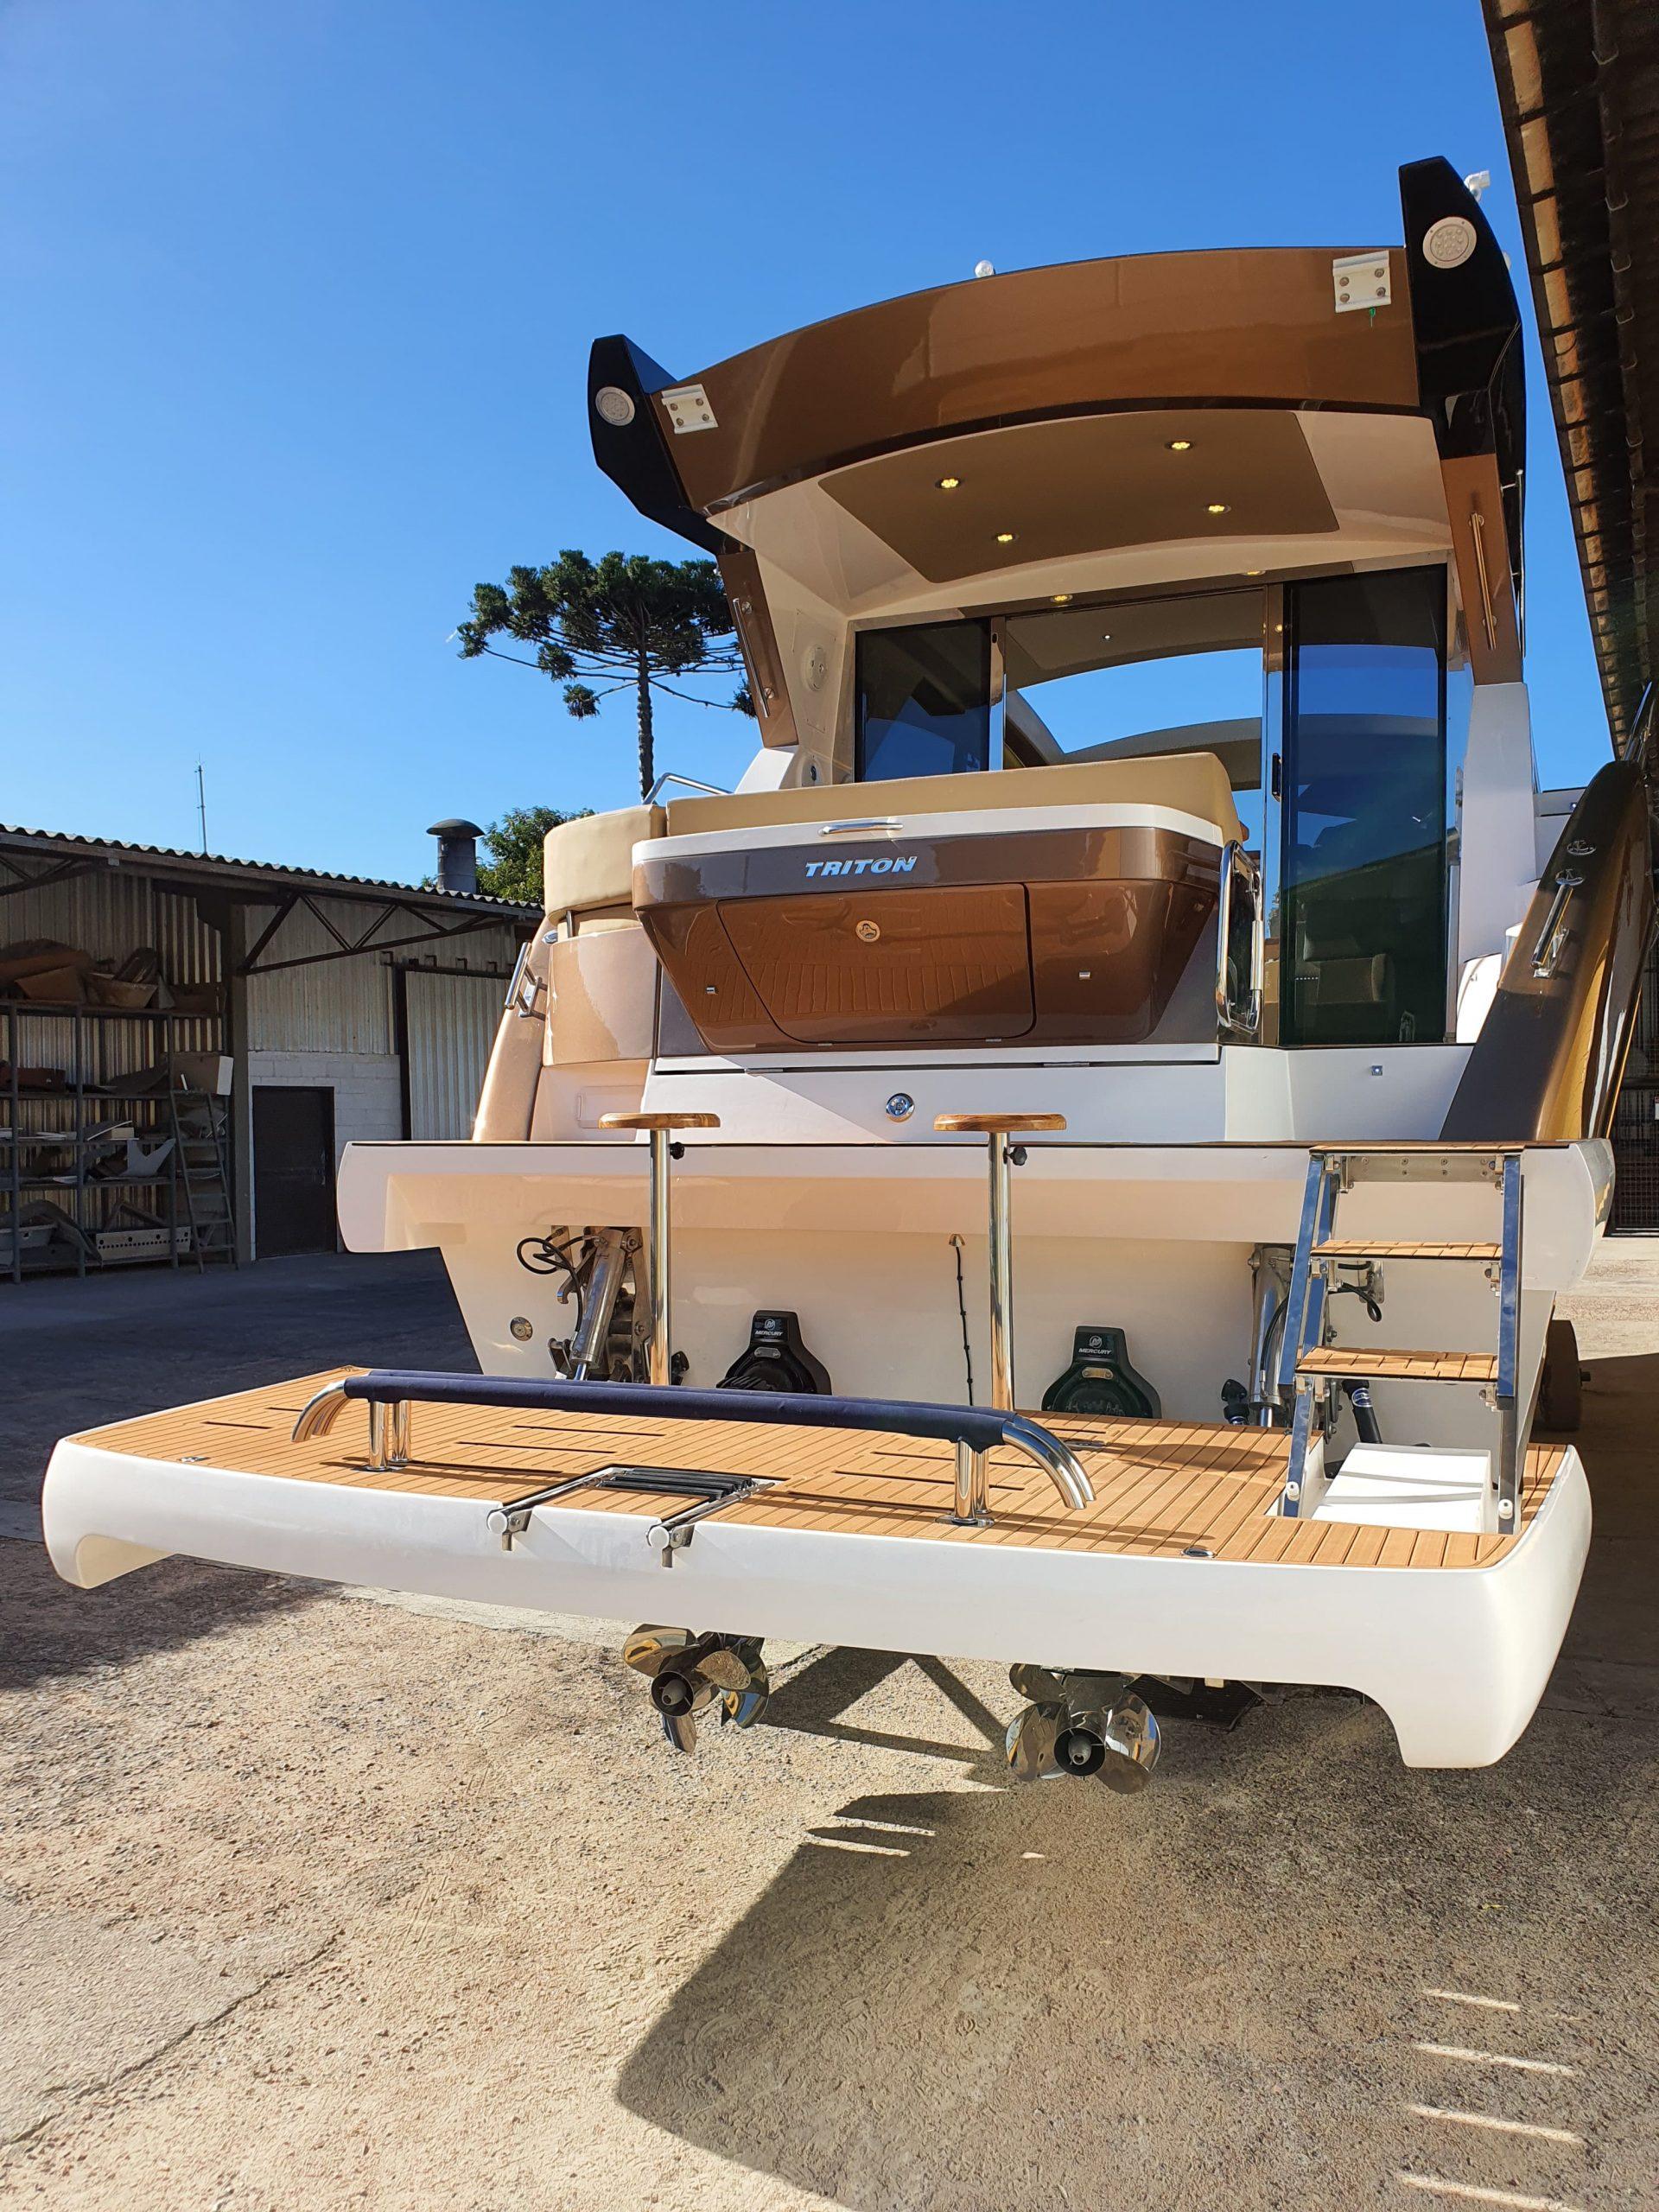 Triton 470 HT - Foto Divulgação Triton Yachts (19) - boat shopping